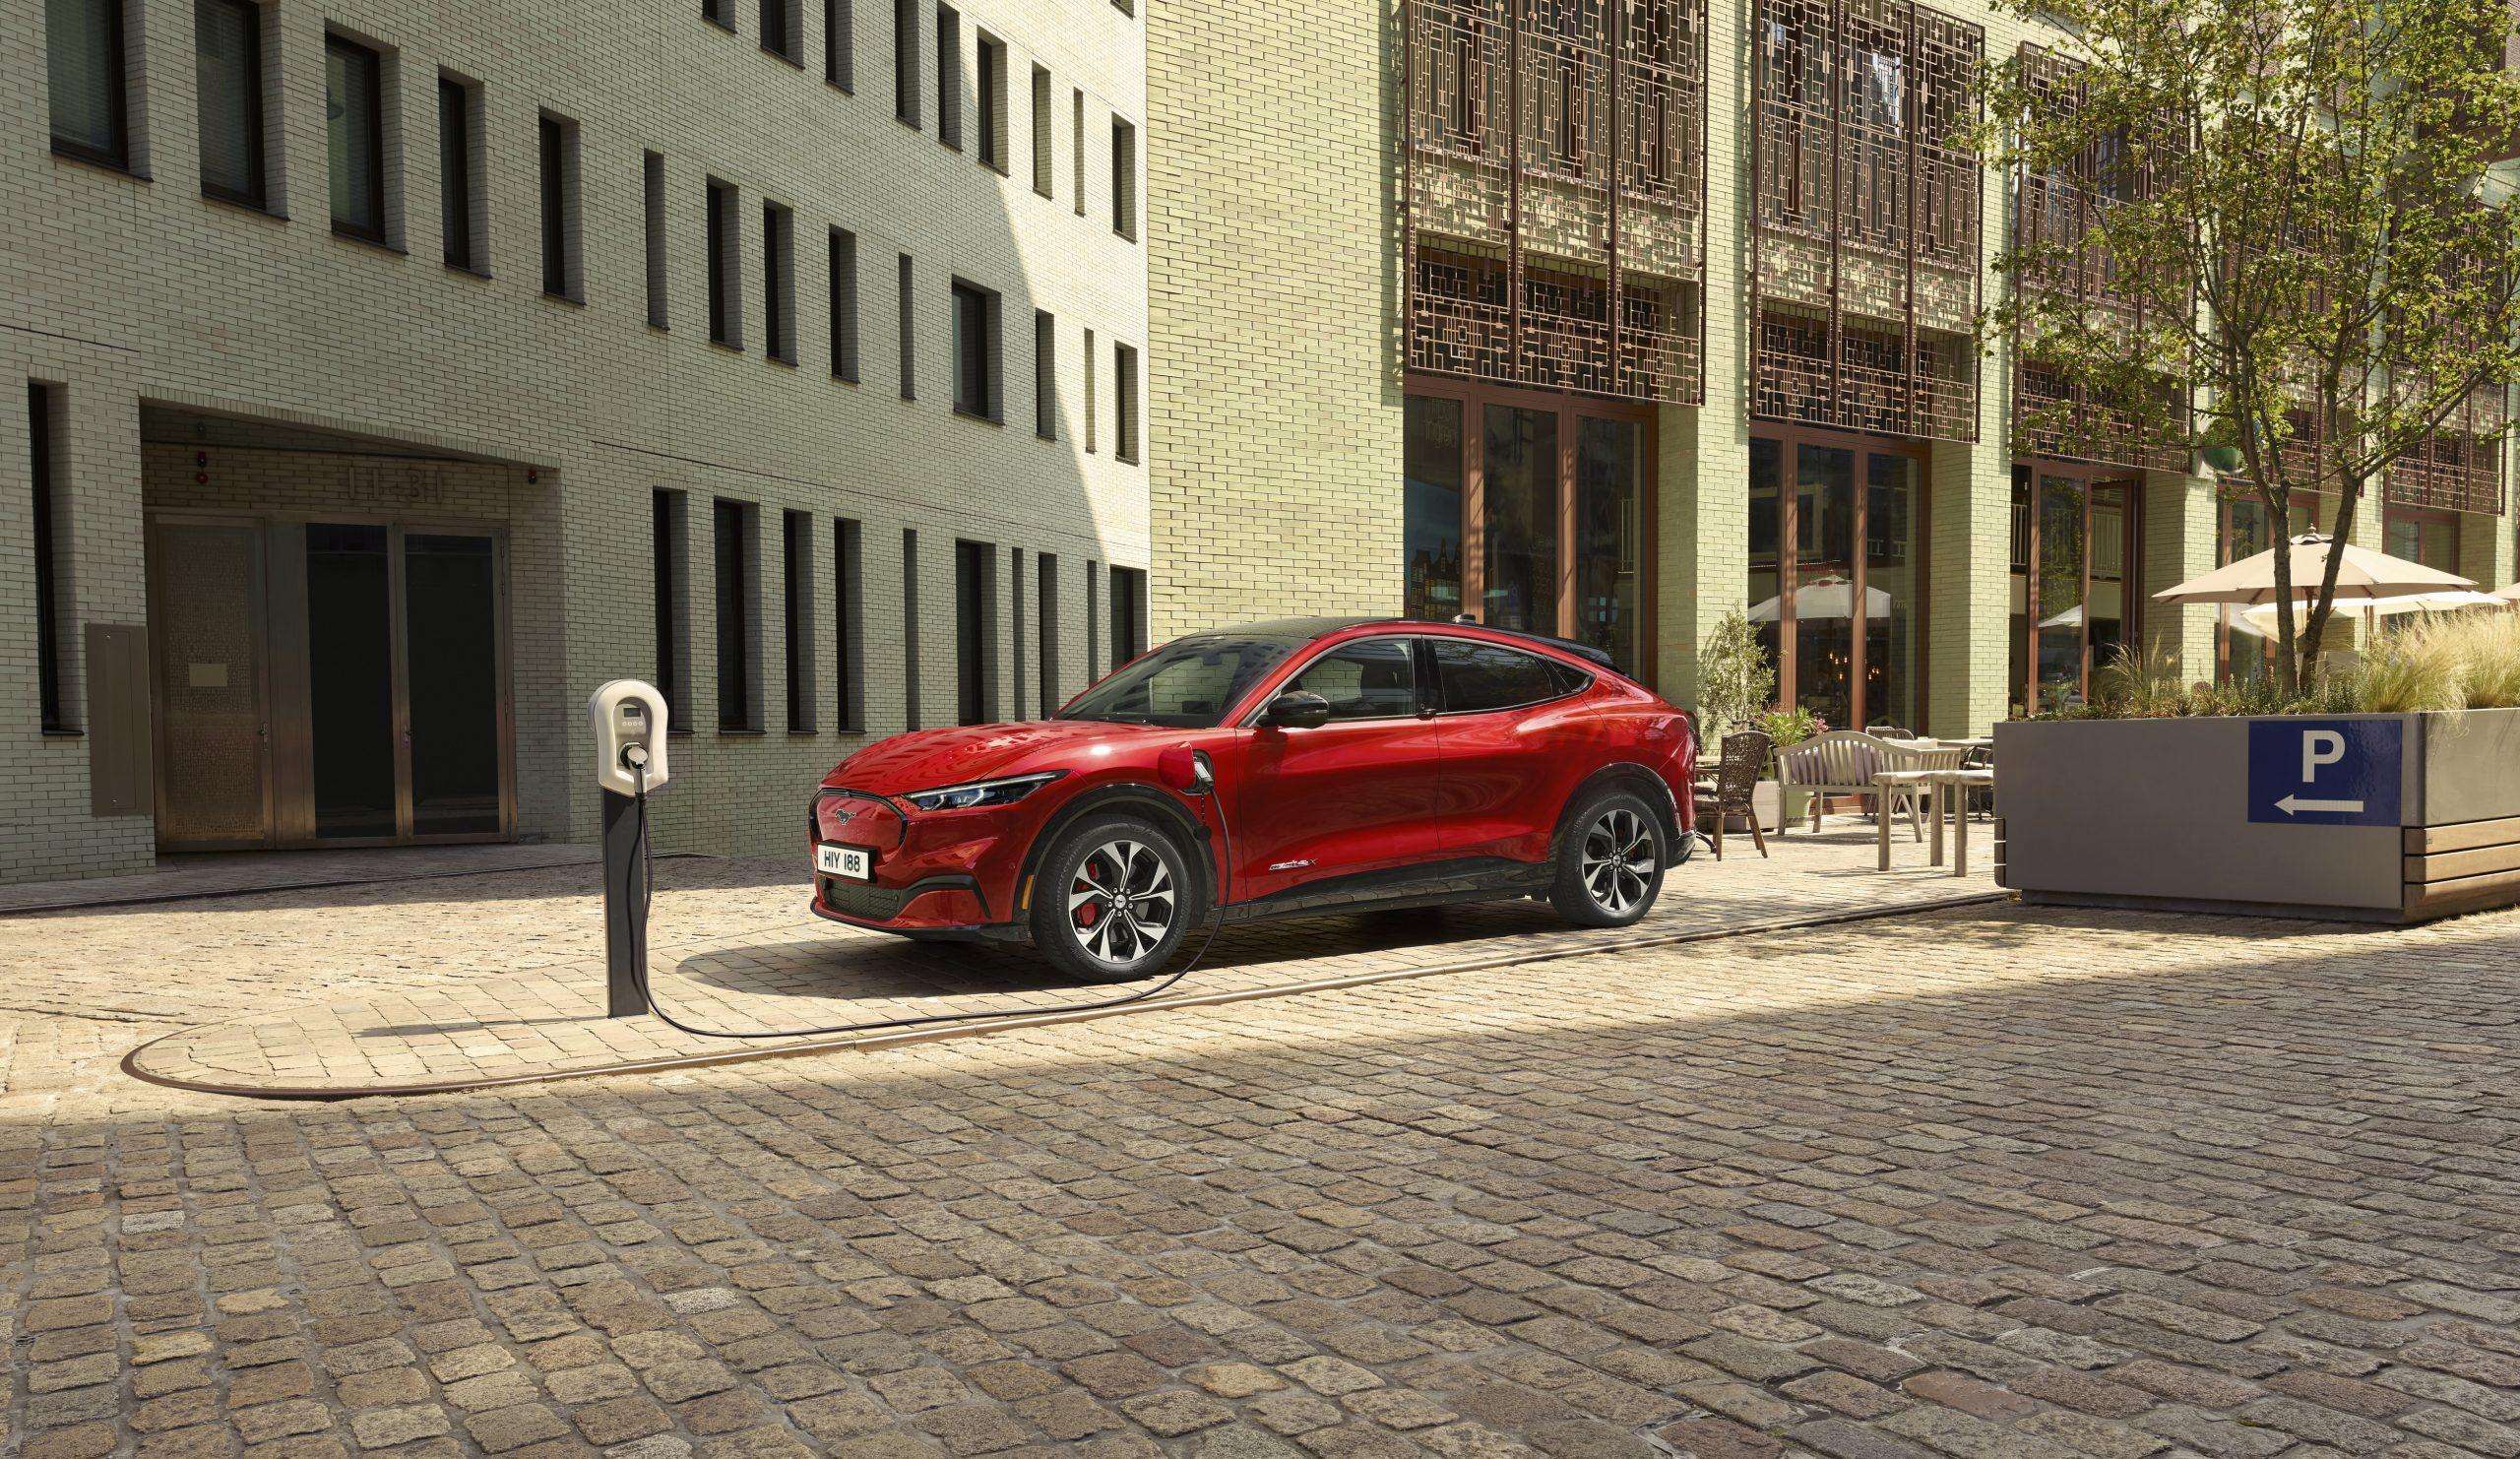 2020 FORD MACH E AWD 03 scaled Από 51.587 ευρώ η τιμή της Ford Mustang Mach-E στην Ελλάδα Electric cars, electric vehicles, EV, Ford, Ford Mustang, Ford Mustang Mach-E, zblog, ειδήσεις, ηλεκτρικά, ηλεκτροκινηση, κινουμαι ηλεκτρικα, Νέα